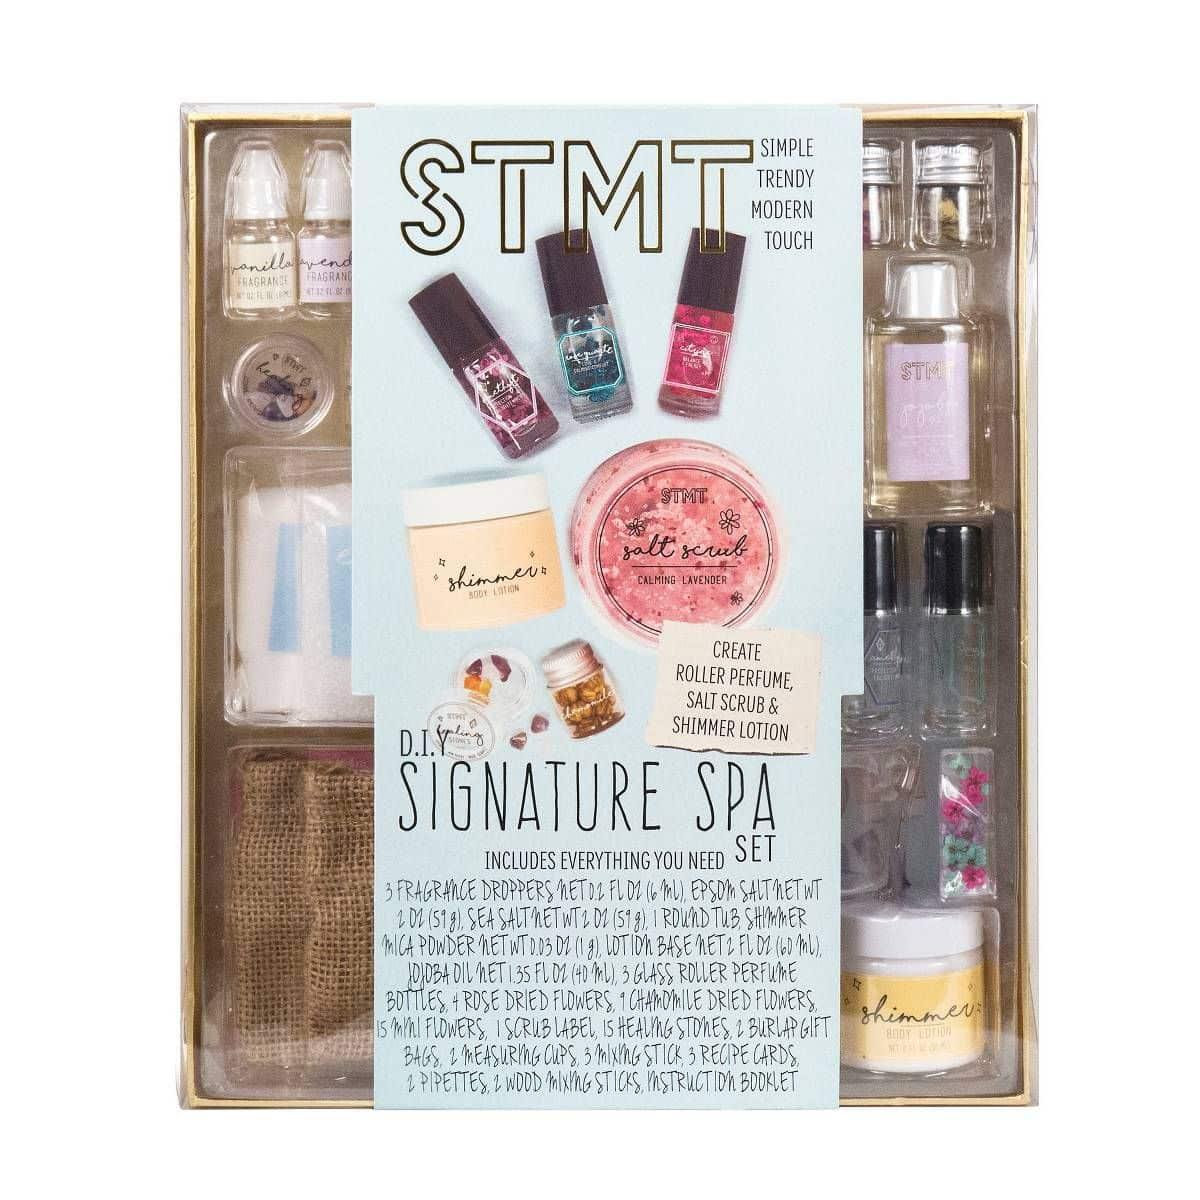 Diy Signature Spa Perfume And Salt Scrub Set Samko Corporate Party Roller Beat Lama